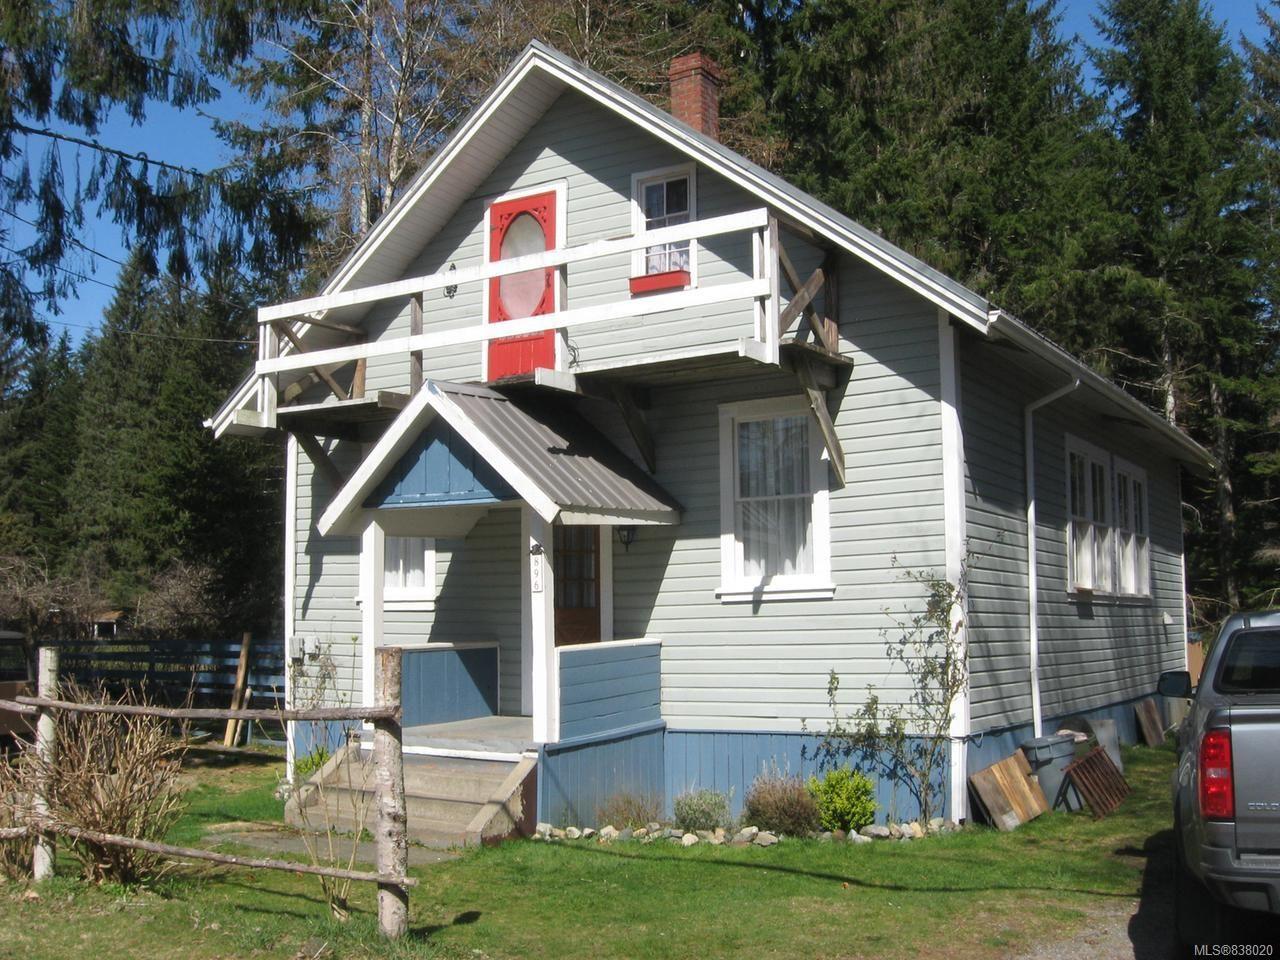 Main Photo: 896 Sayward Rd in SAYWARD: NI Kelsey Bay/Sayward House for sale (North Island)  : MLS®# 838020